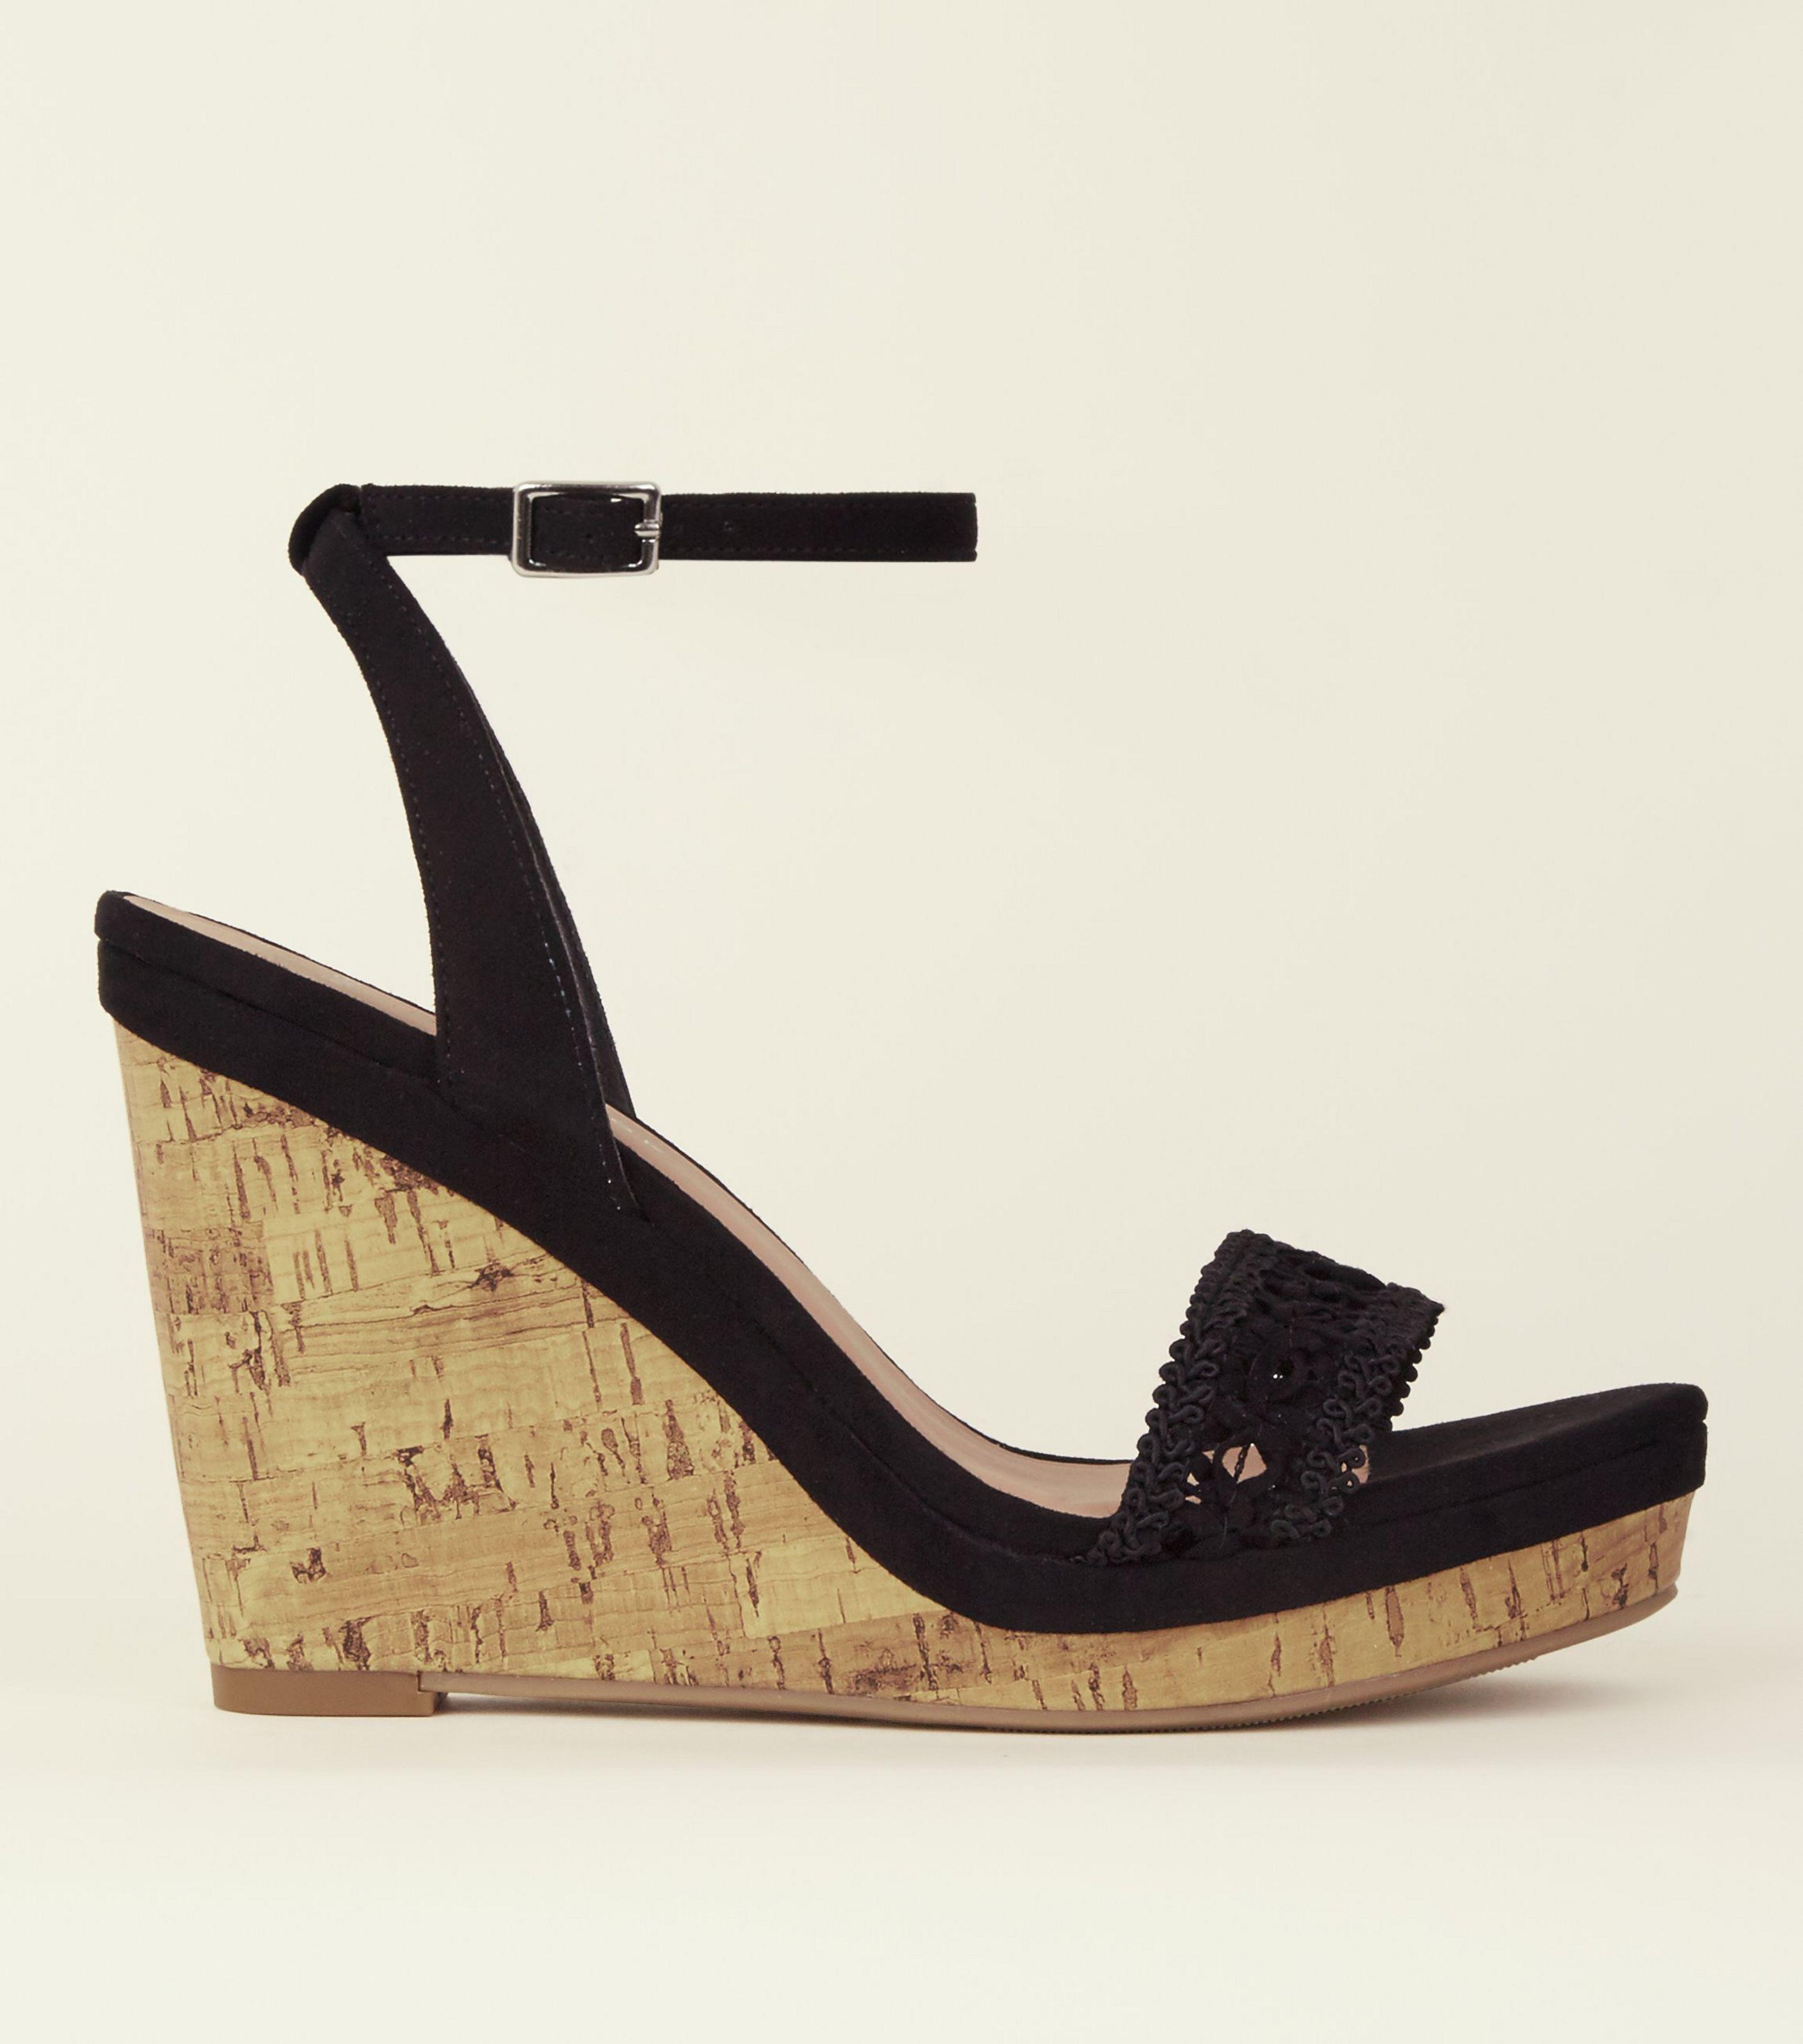 d5357851110 New Look Wide Fit Black Suedette Crochet Strap Cork Wedges in Black ...